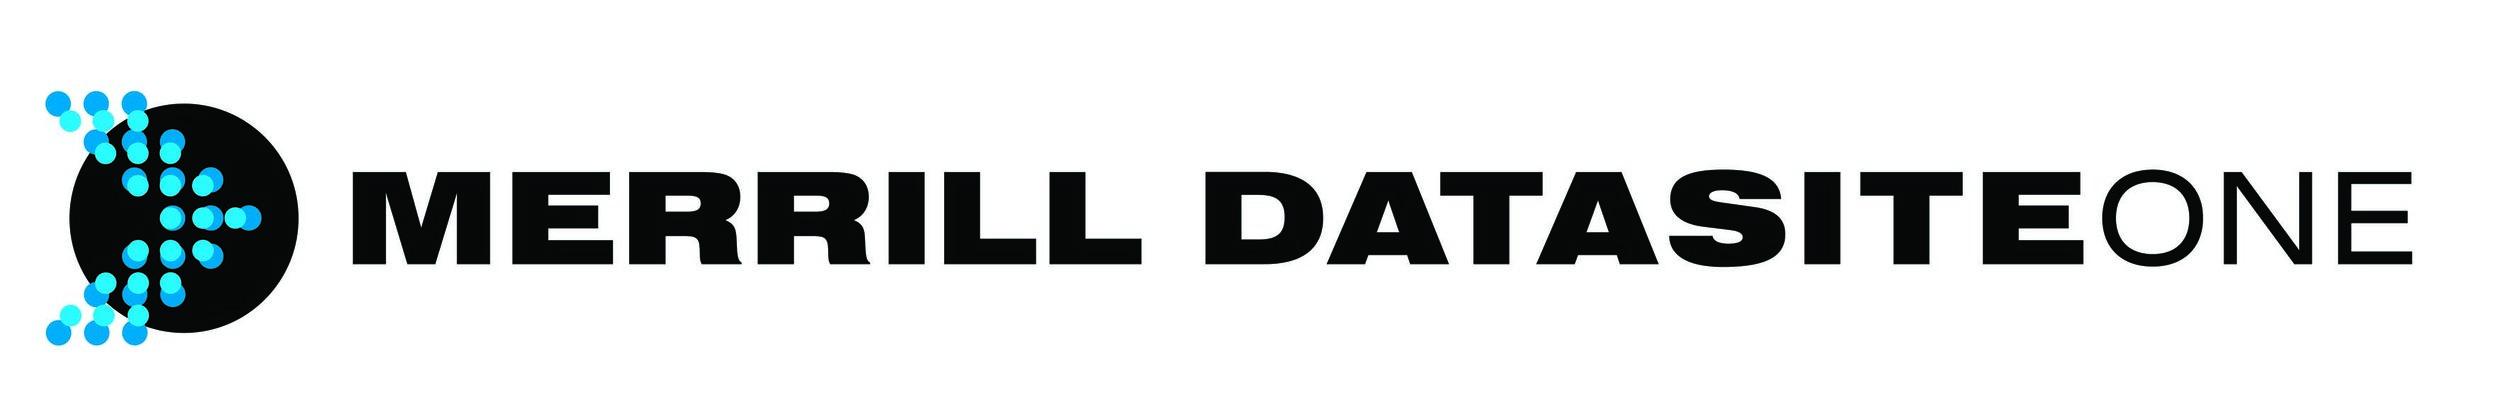 Merrill DatasiteOne Logo JPG format.jpg